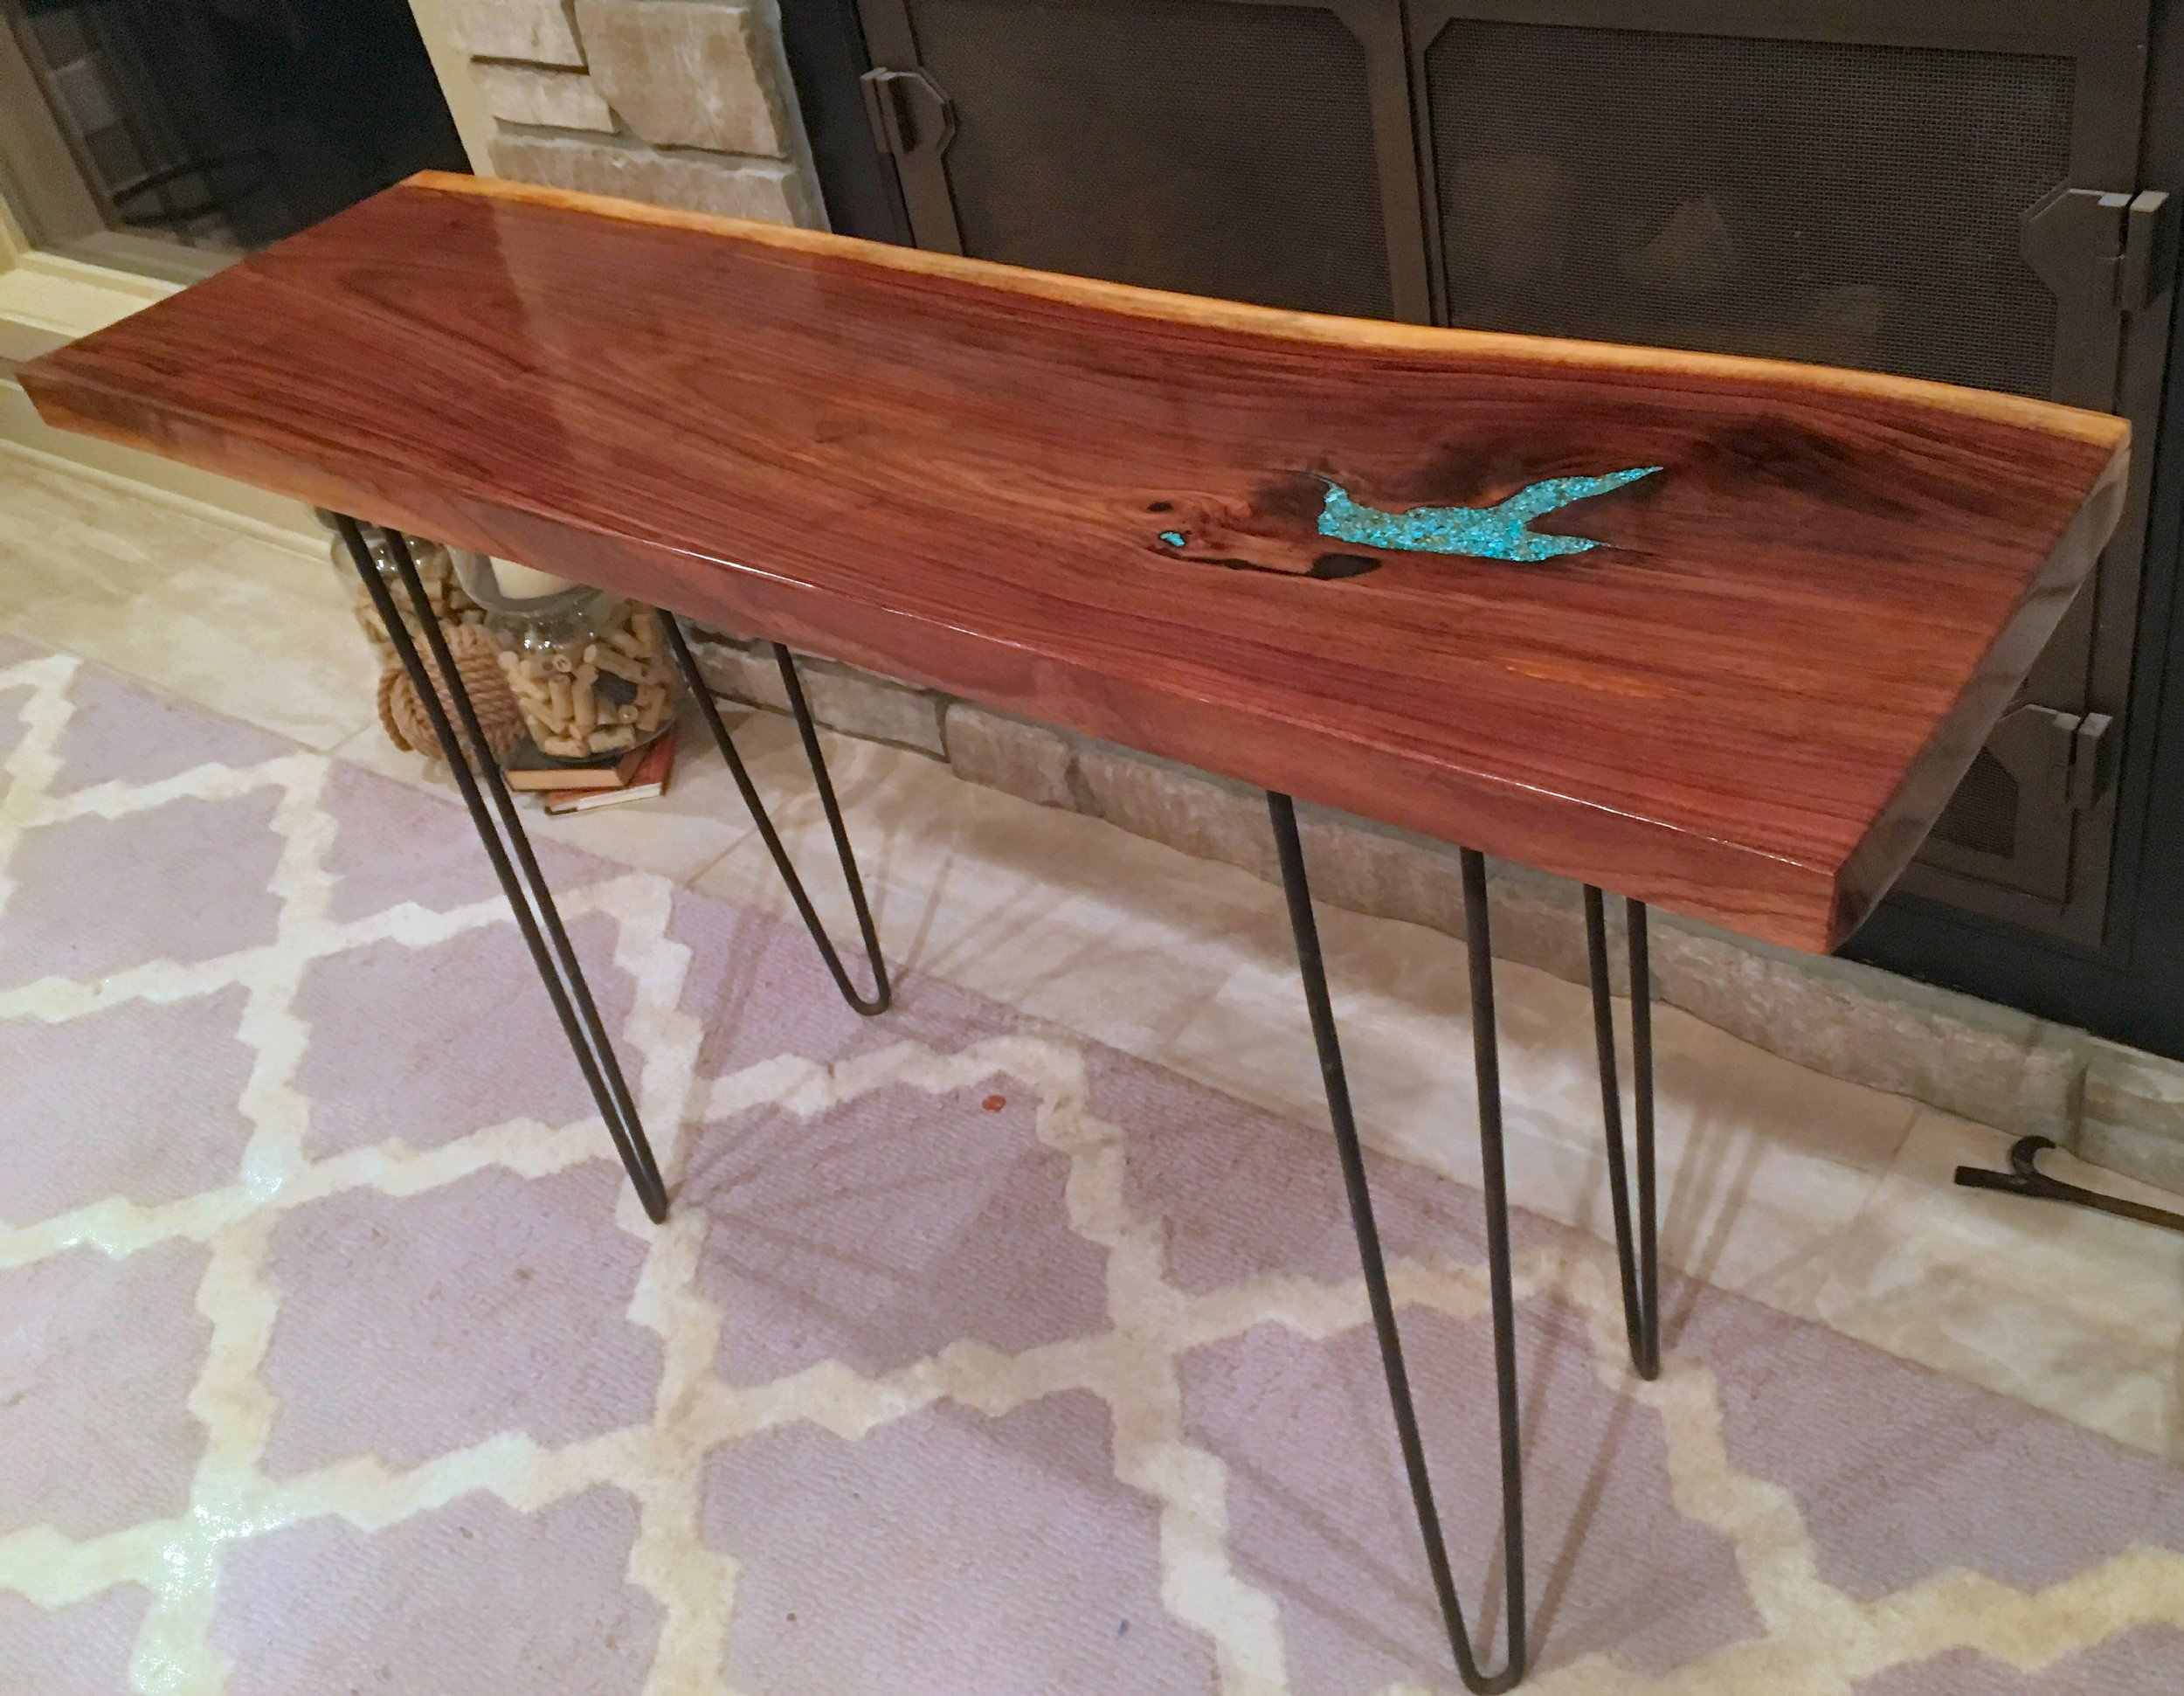 Live Edge Table Legs